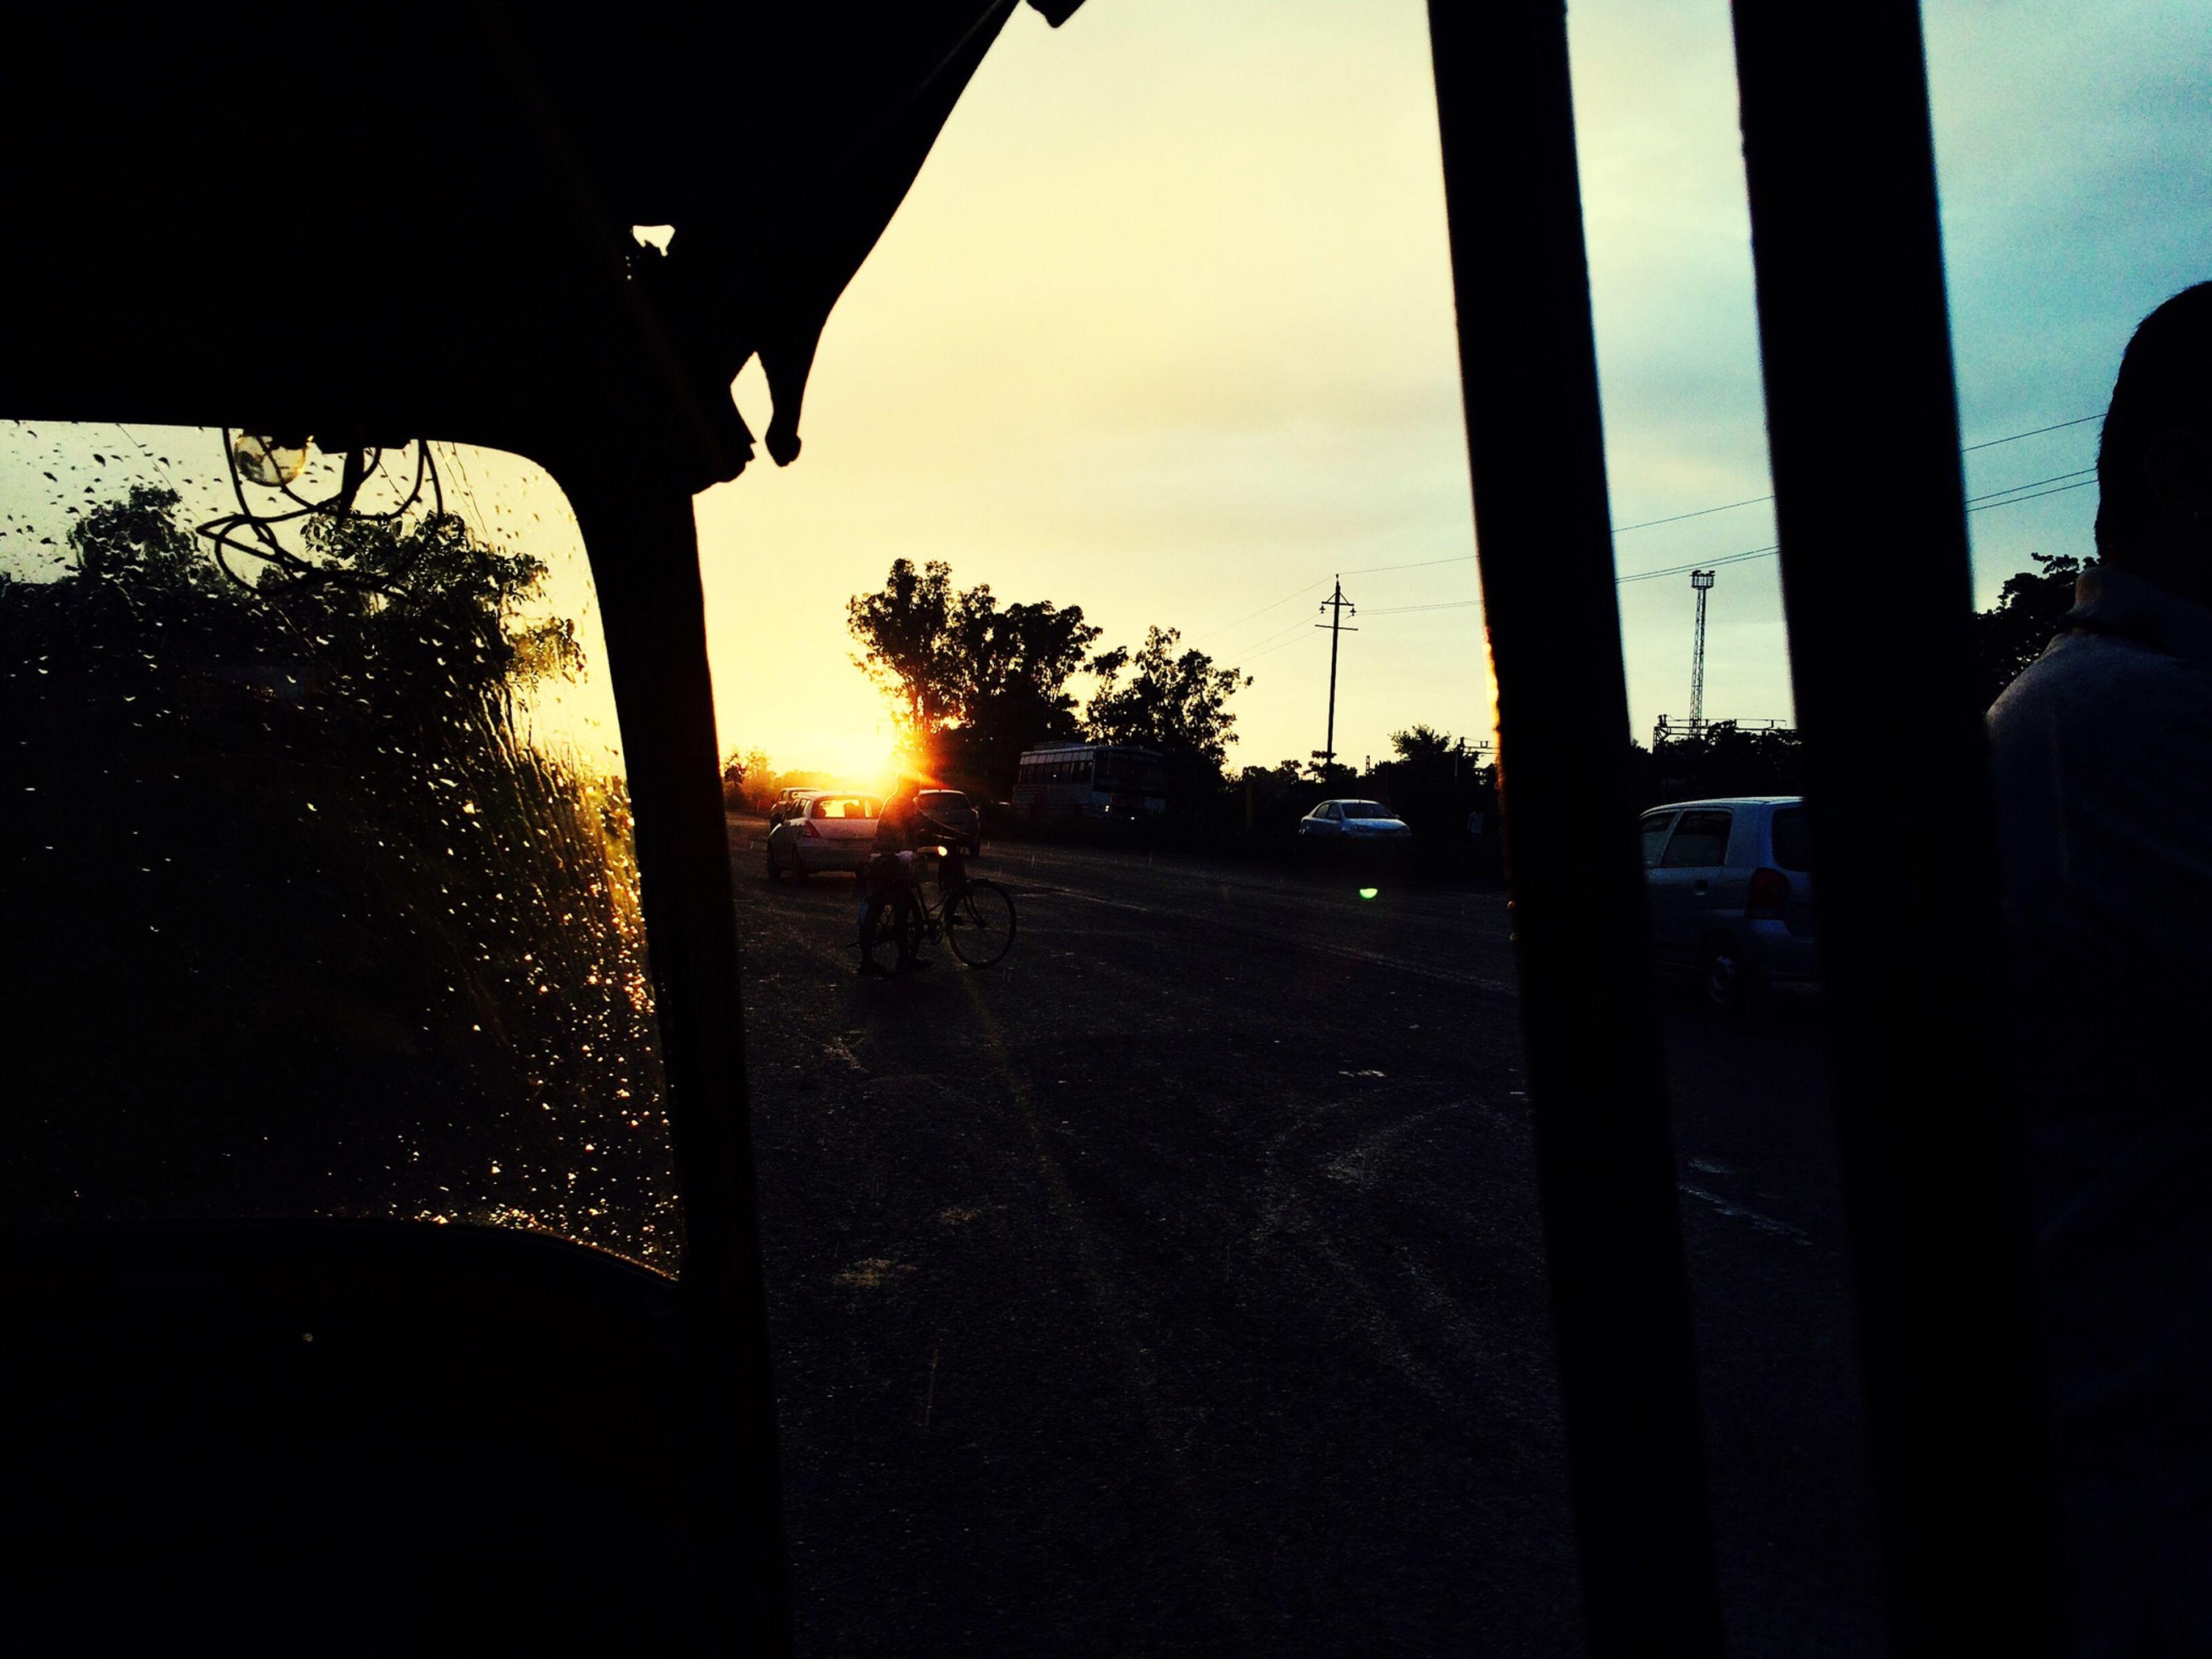 sunset, silhouette, sun, tree, sky, sunlight, sunbeam, transportation, lens flare, car, street, orange color, road, back lit, land vehicle, built structure, dark, cloud - sky, nature, street light